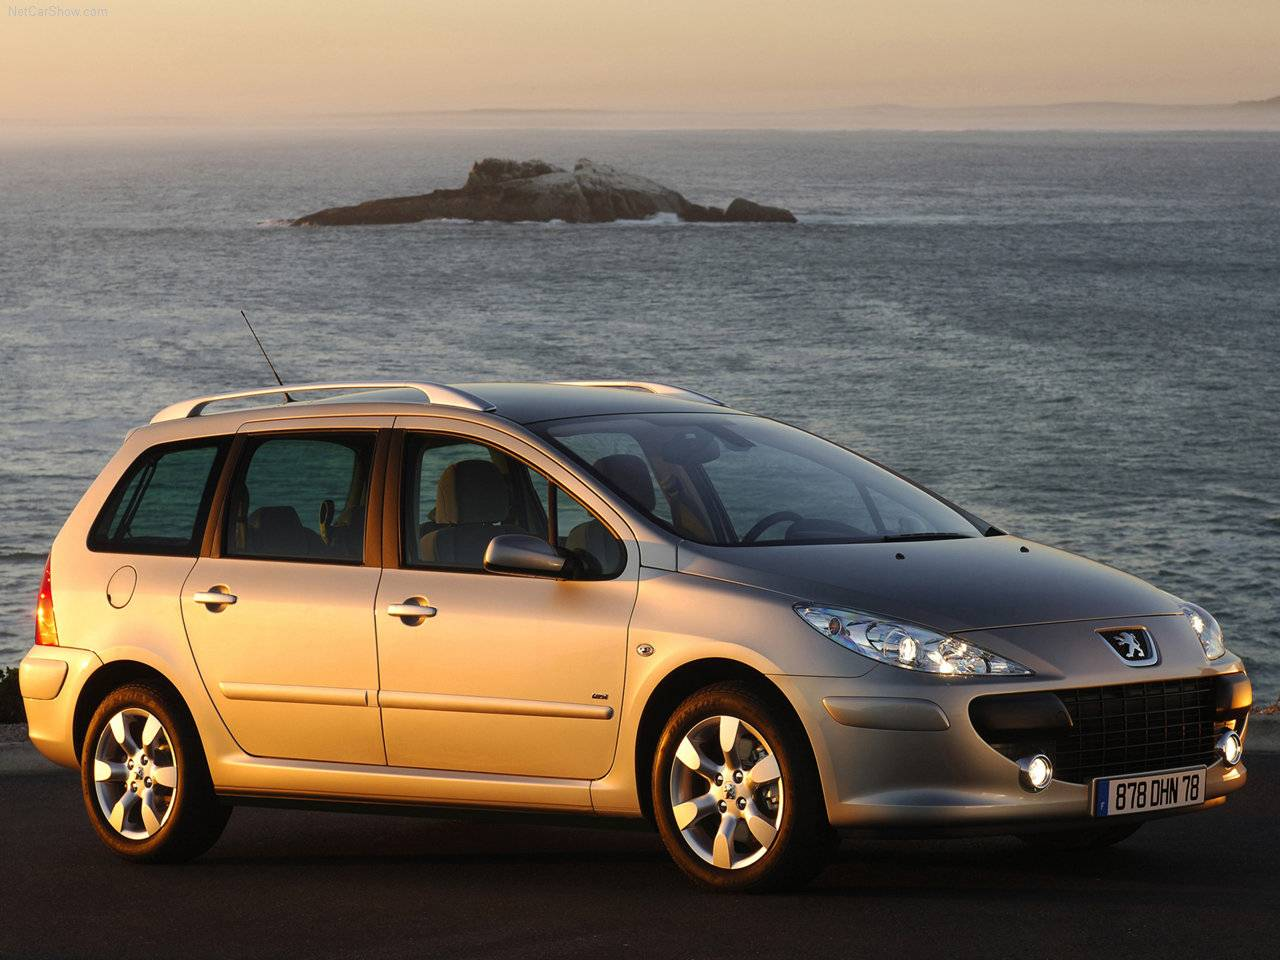 2005 Peugeot 307 Sw